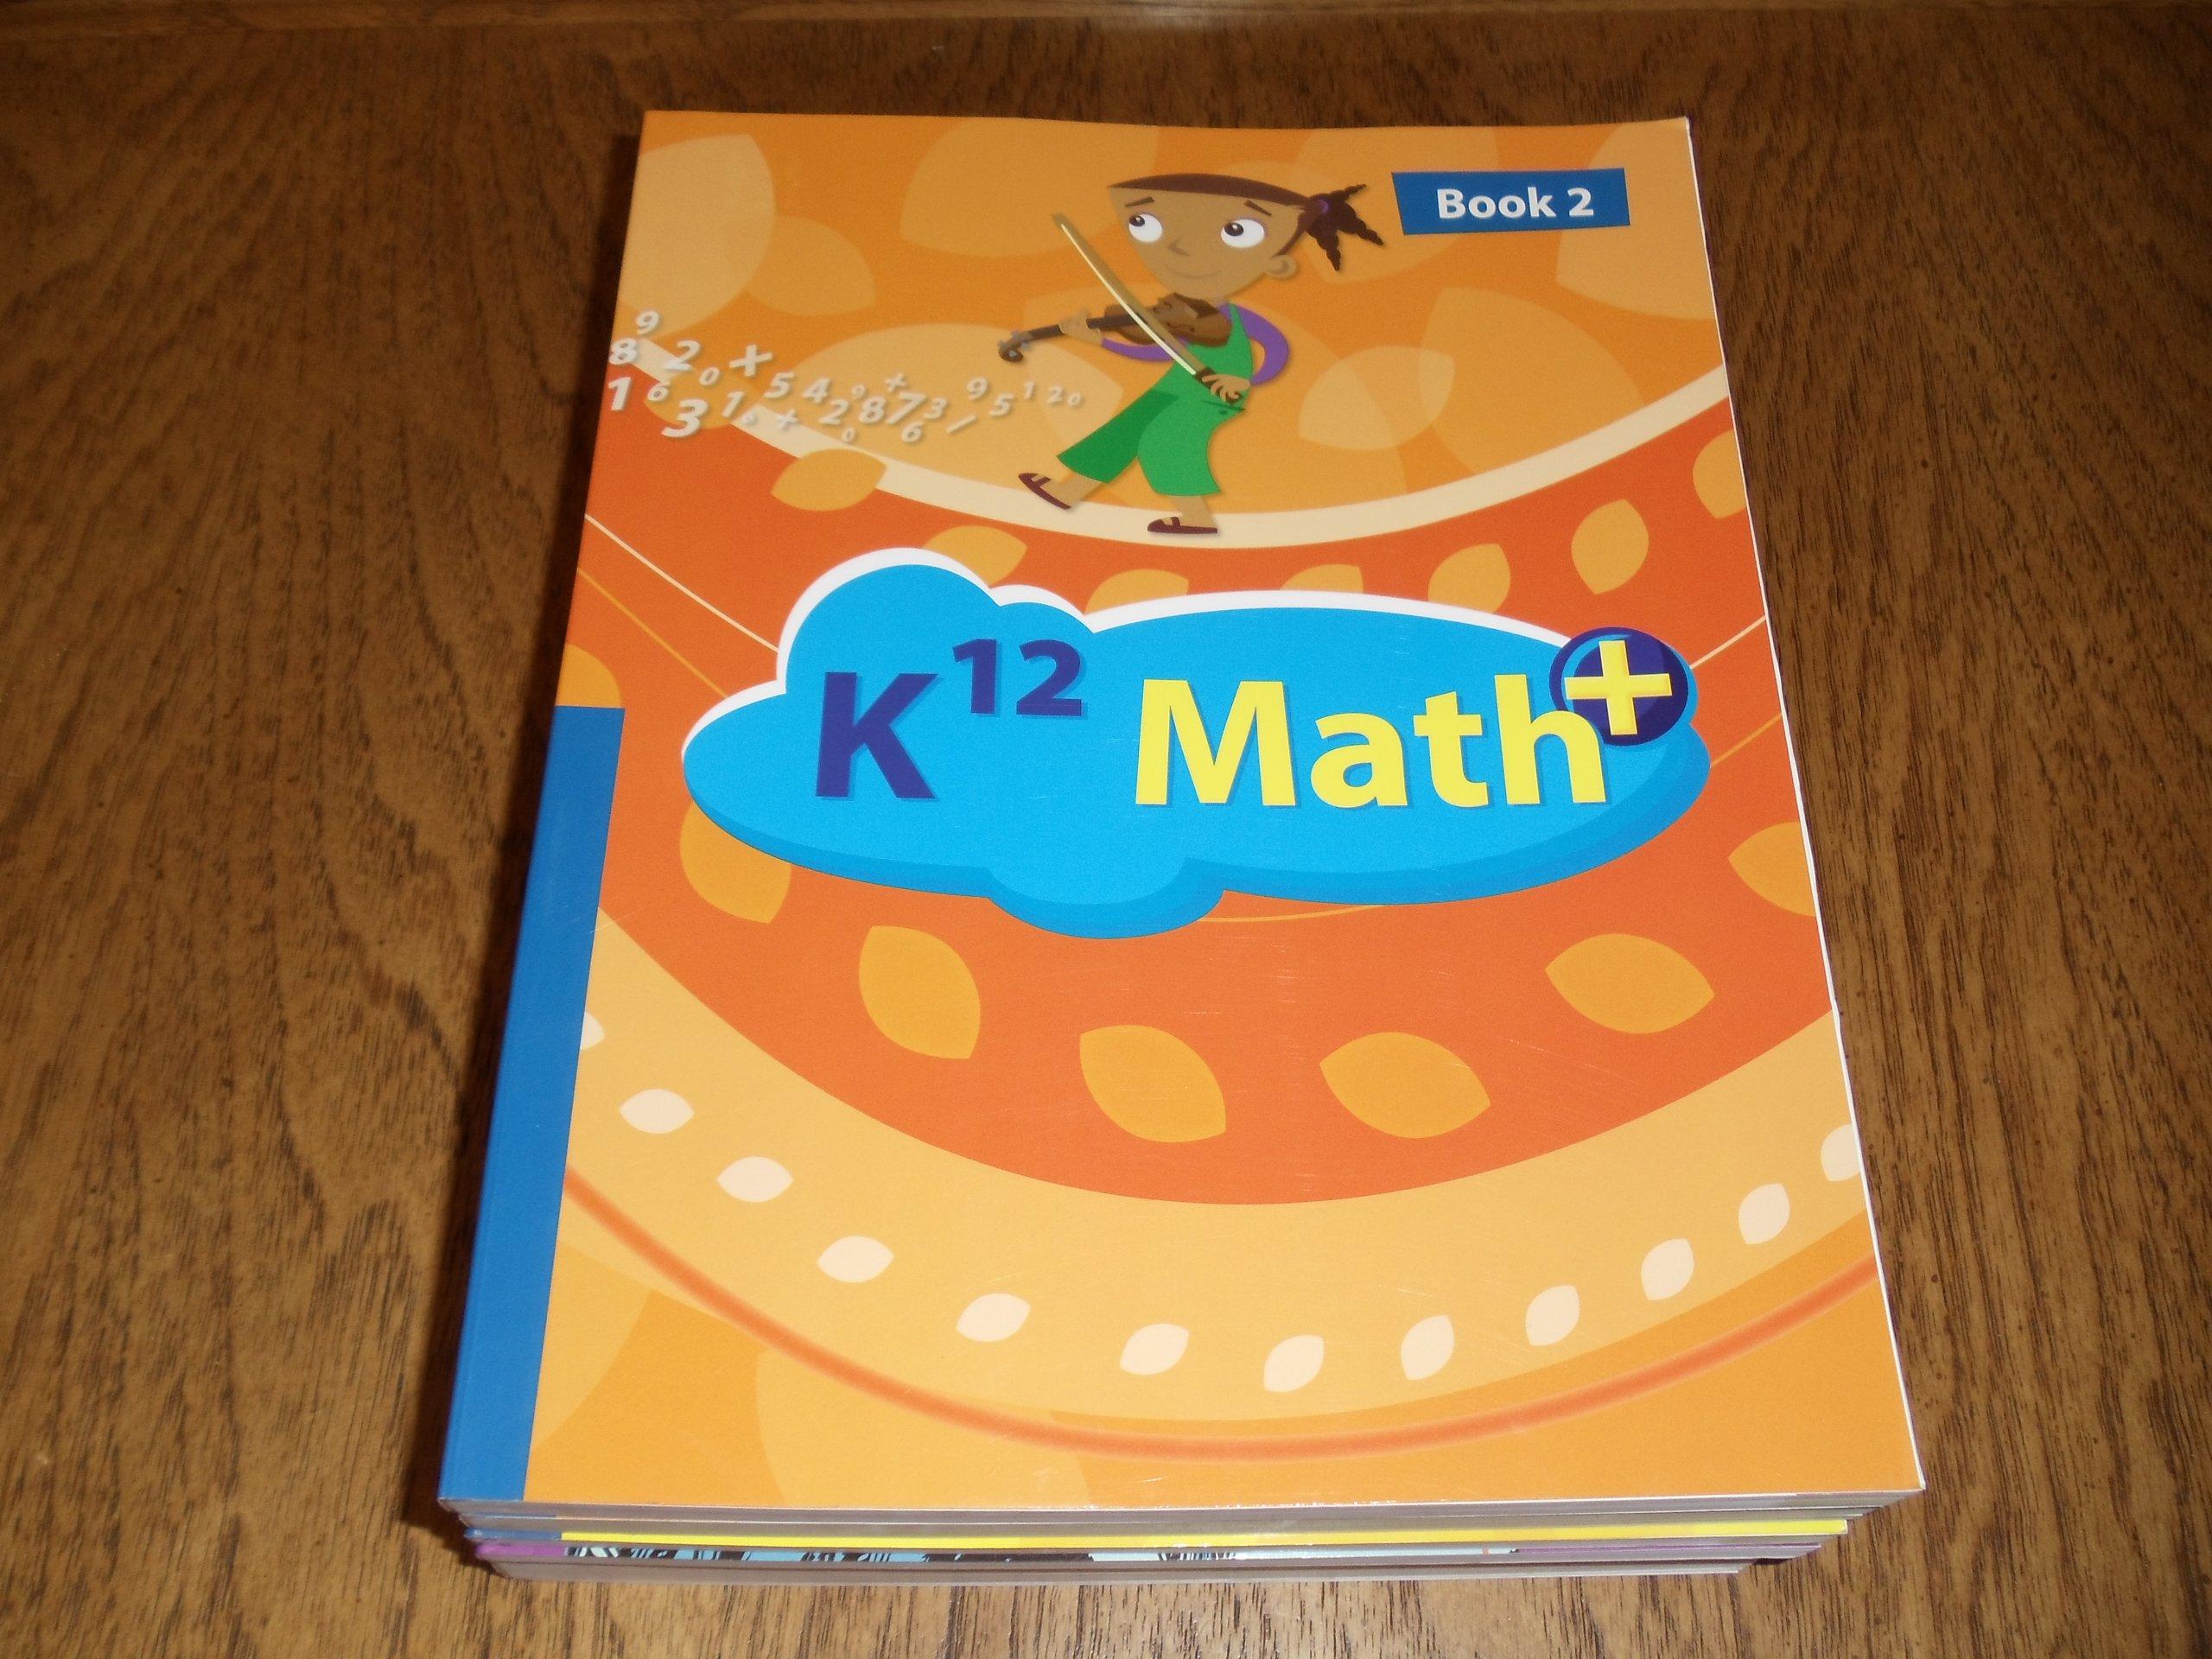 Download K12 Math+, Activity Book - Book 2. #10222 (Orange). pdf